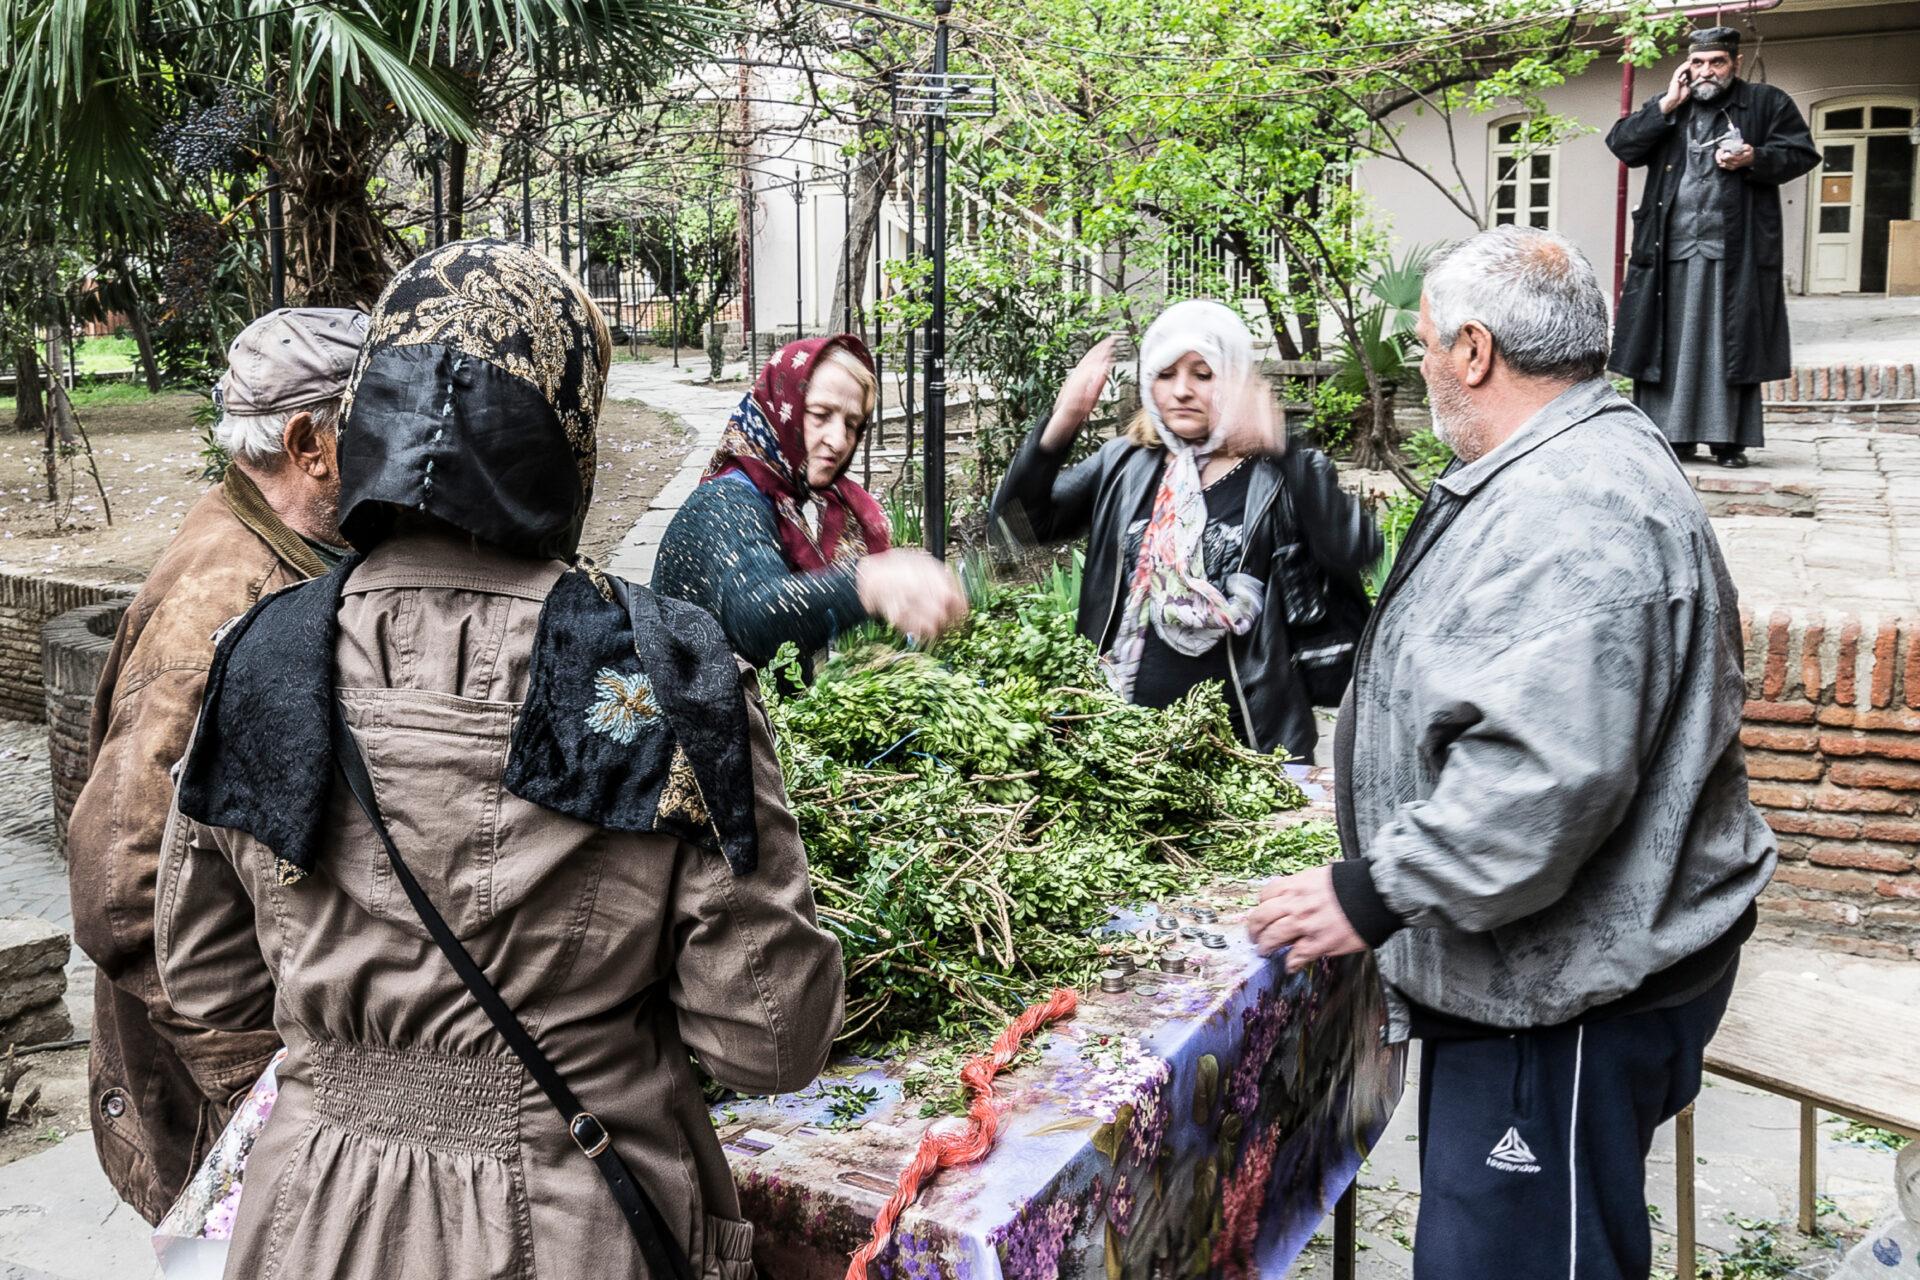 Тбилиси, Грузия, апрель 2017